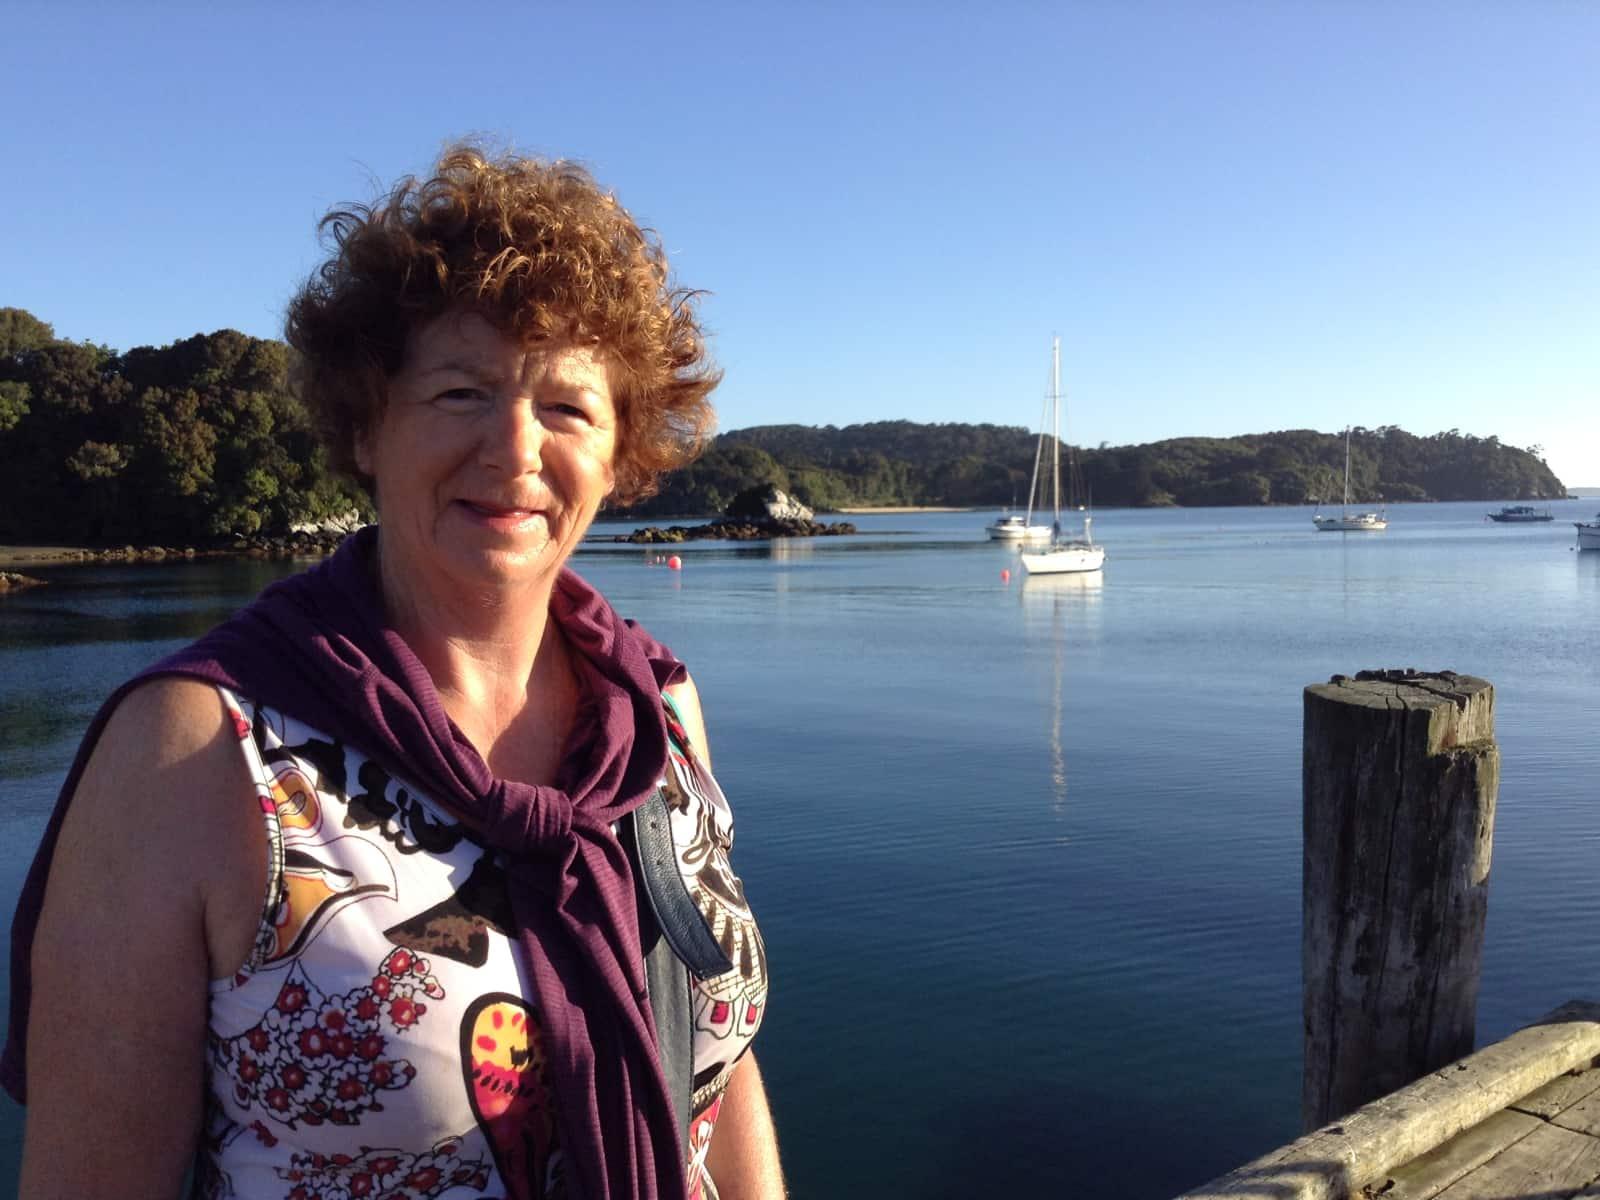 Miriam from Gisborne, New Zealand